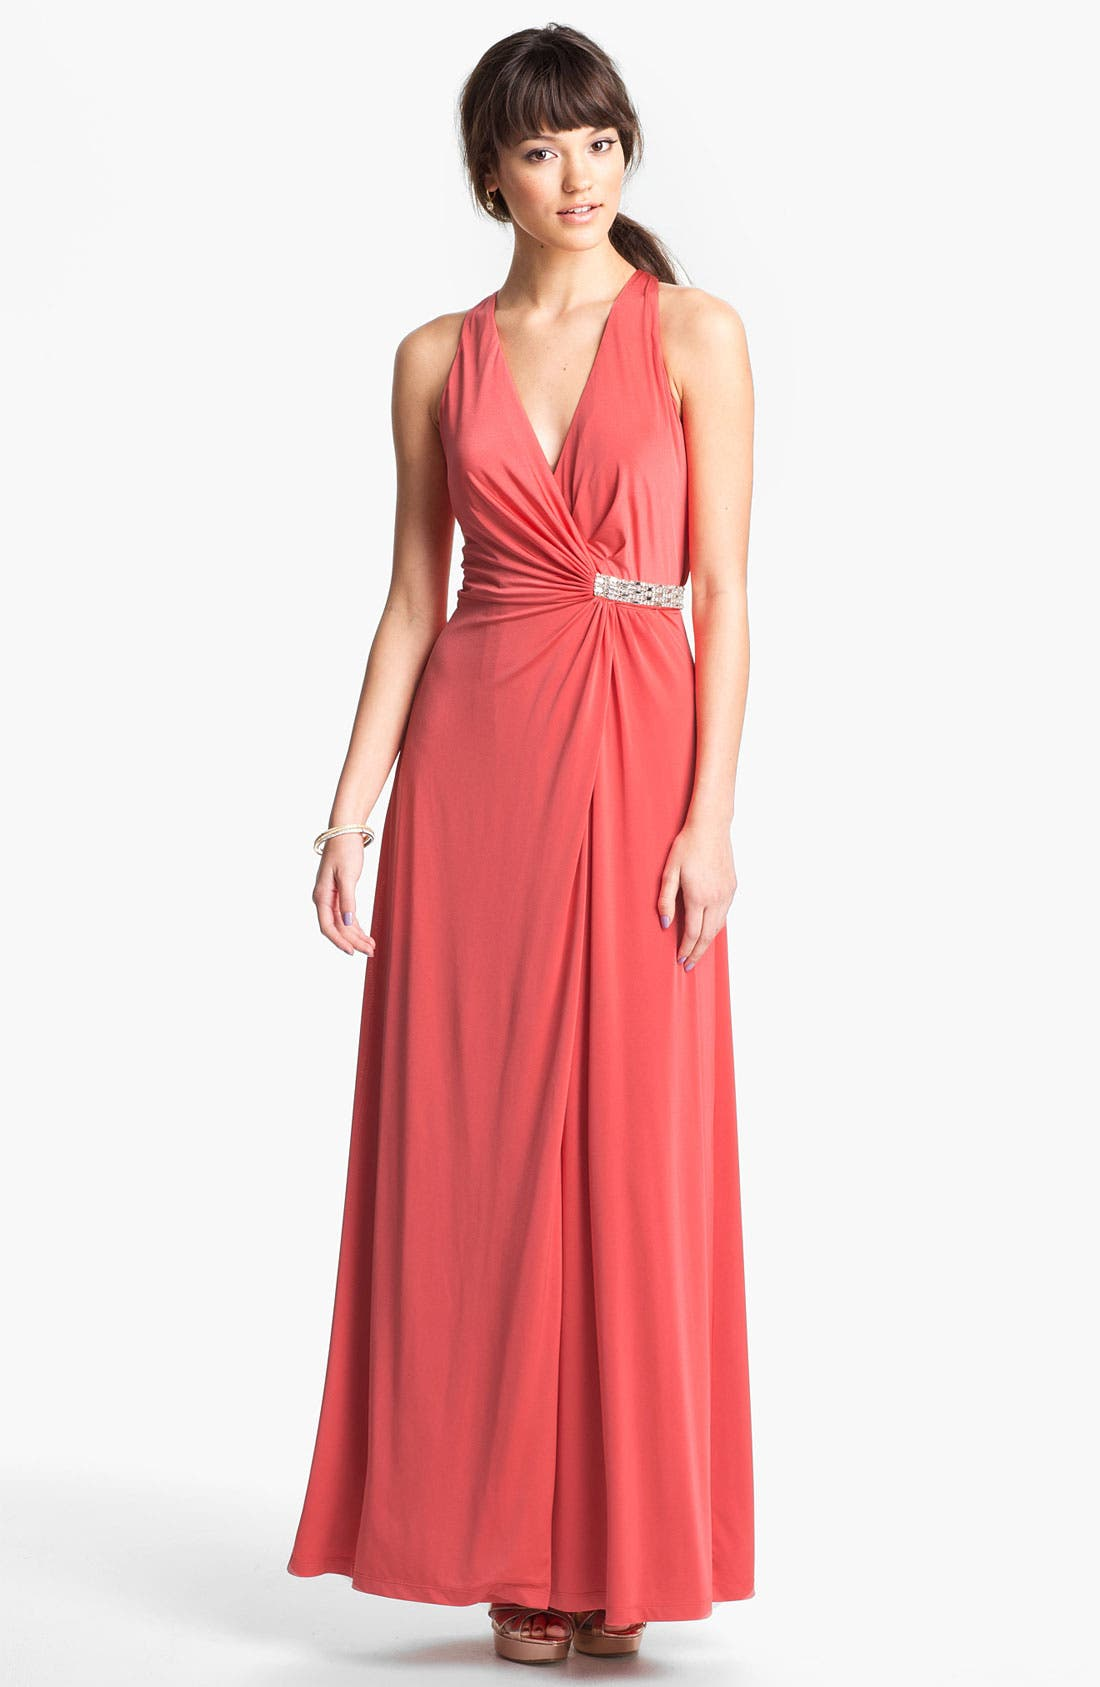 Alternate Image 1 Selected - Calvin Klein Embellished V-Neck Draped Jersey Gown